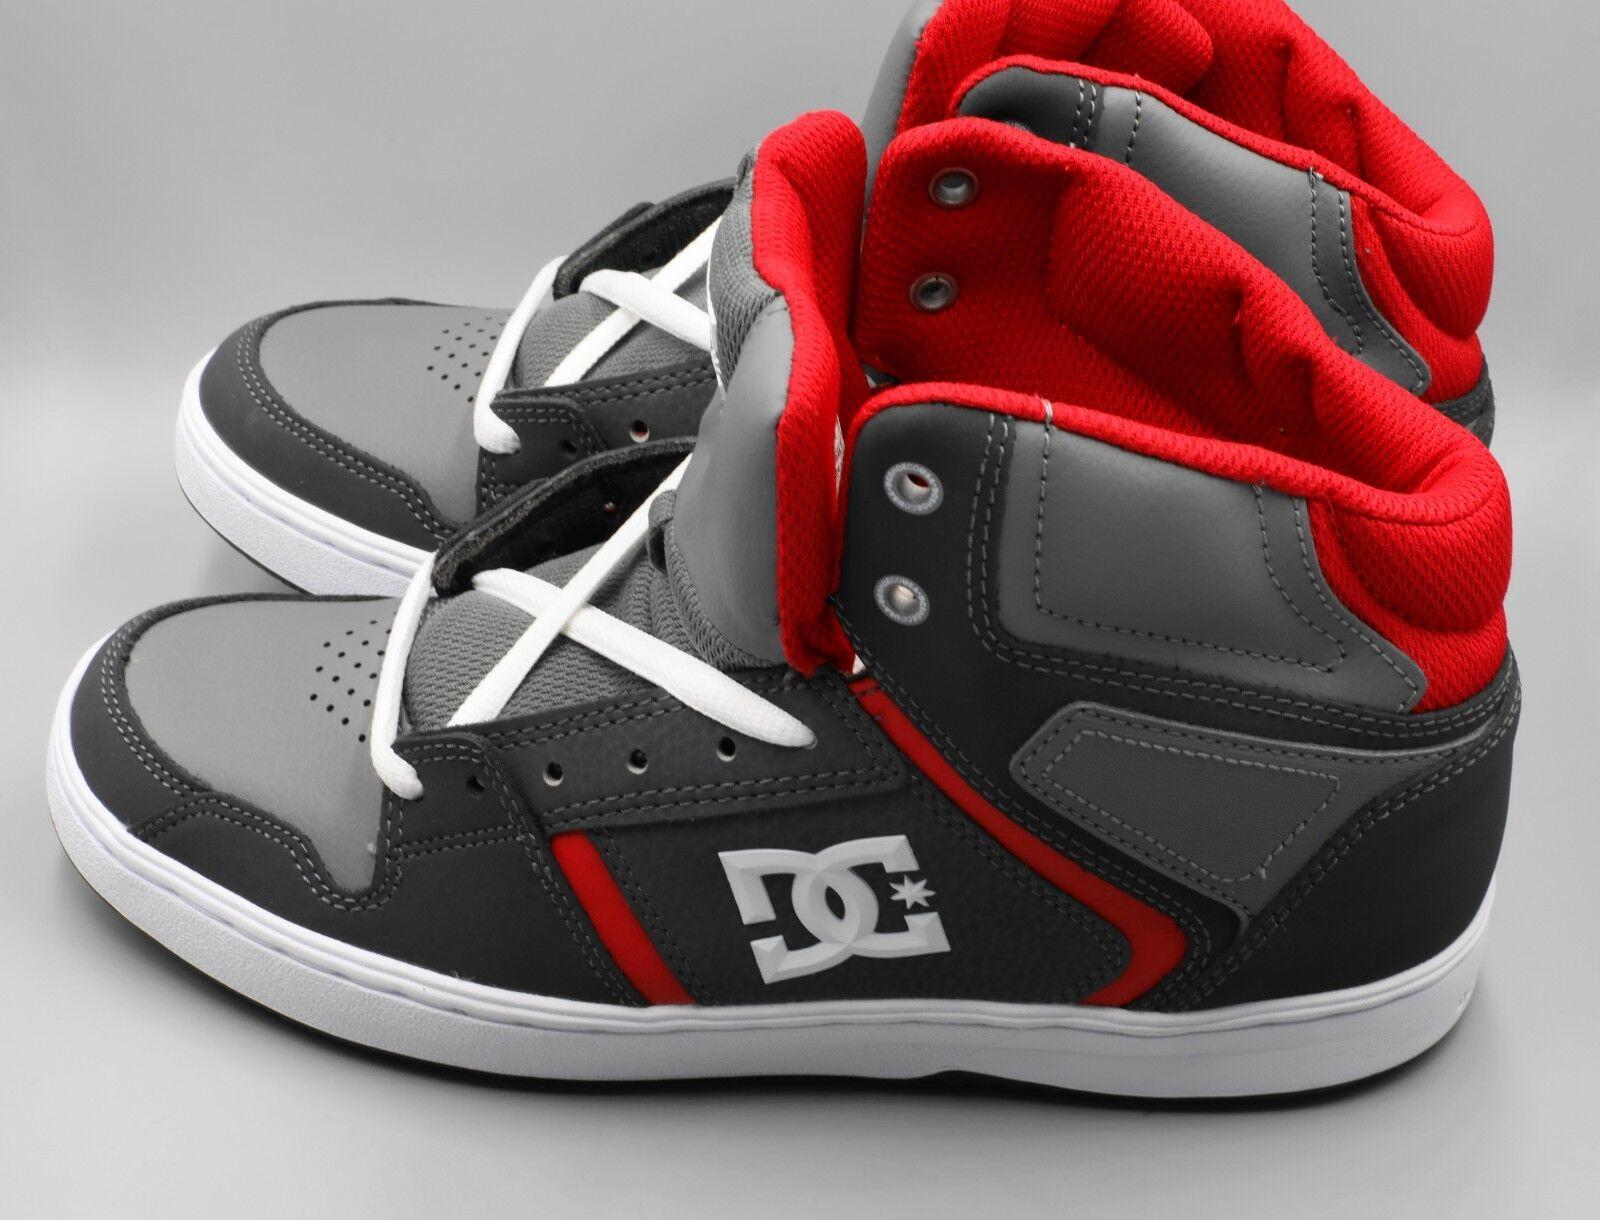 DC Aspect Hi-Top Dark Grey Size 8.5 shoes Men's ADYS100363